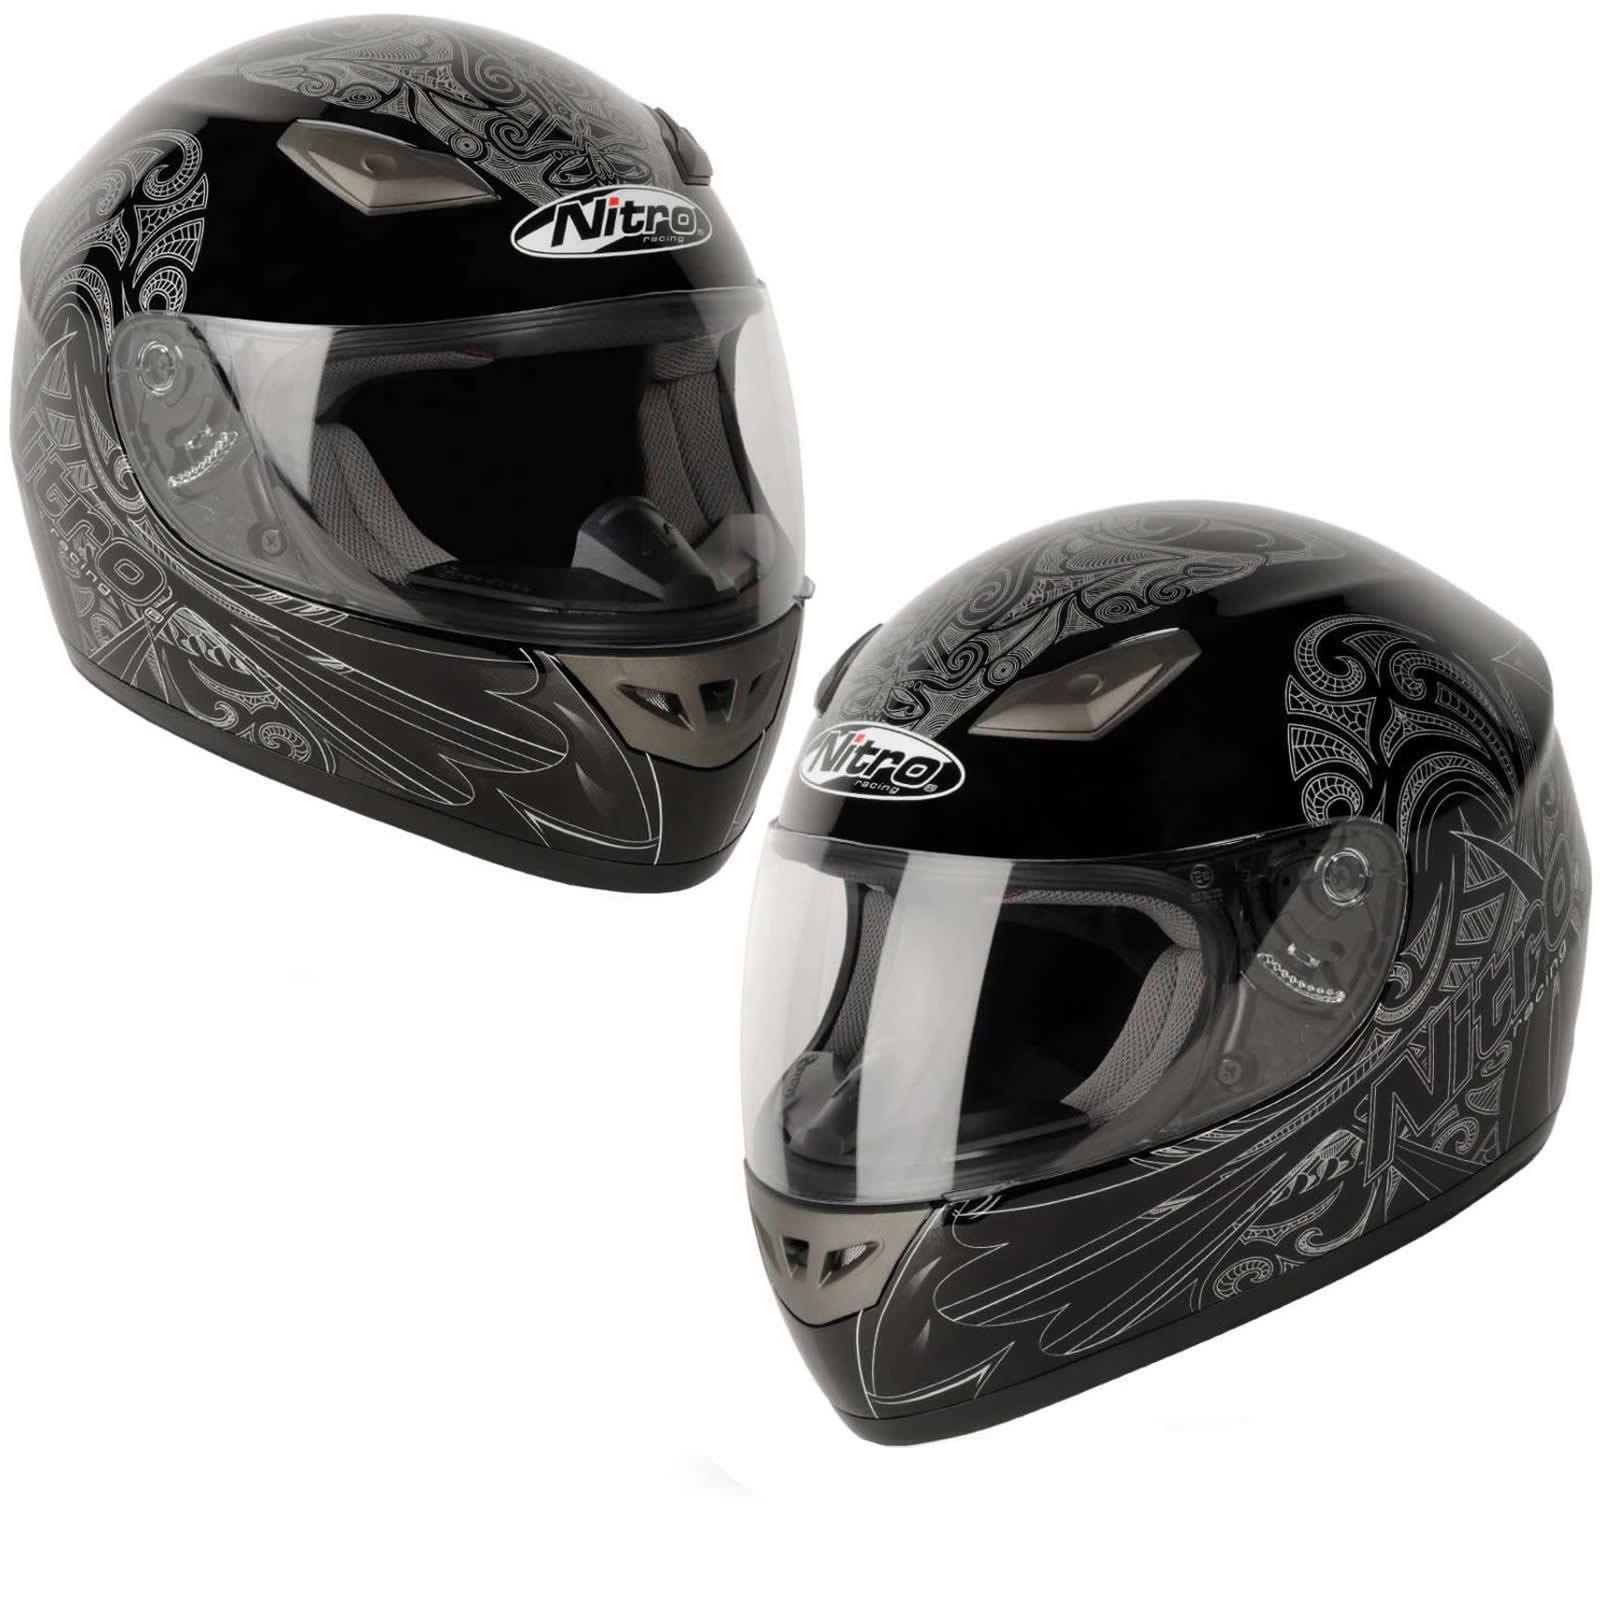 NITRO MOKO LUXE TRIBAL GRAPHIC TATTOO FULL FACE MOTORCYCLE  : 8951 Nitro Moko Luxe Motorcycle Helmet 1600 0 Tribal Motorcycle <strong>Tattoo</strong> from www.ebay.co.uk size 1600 x 1600 jpeg 170kB